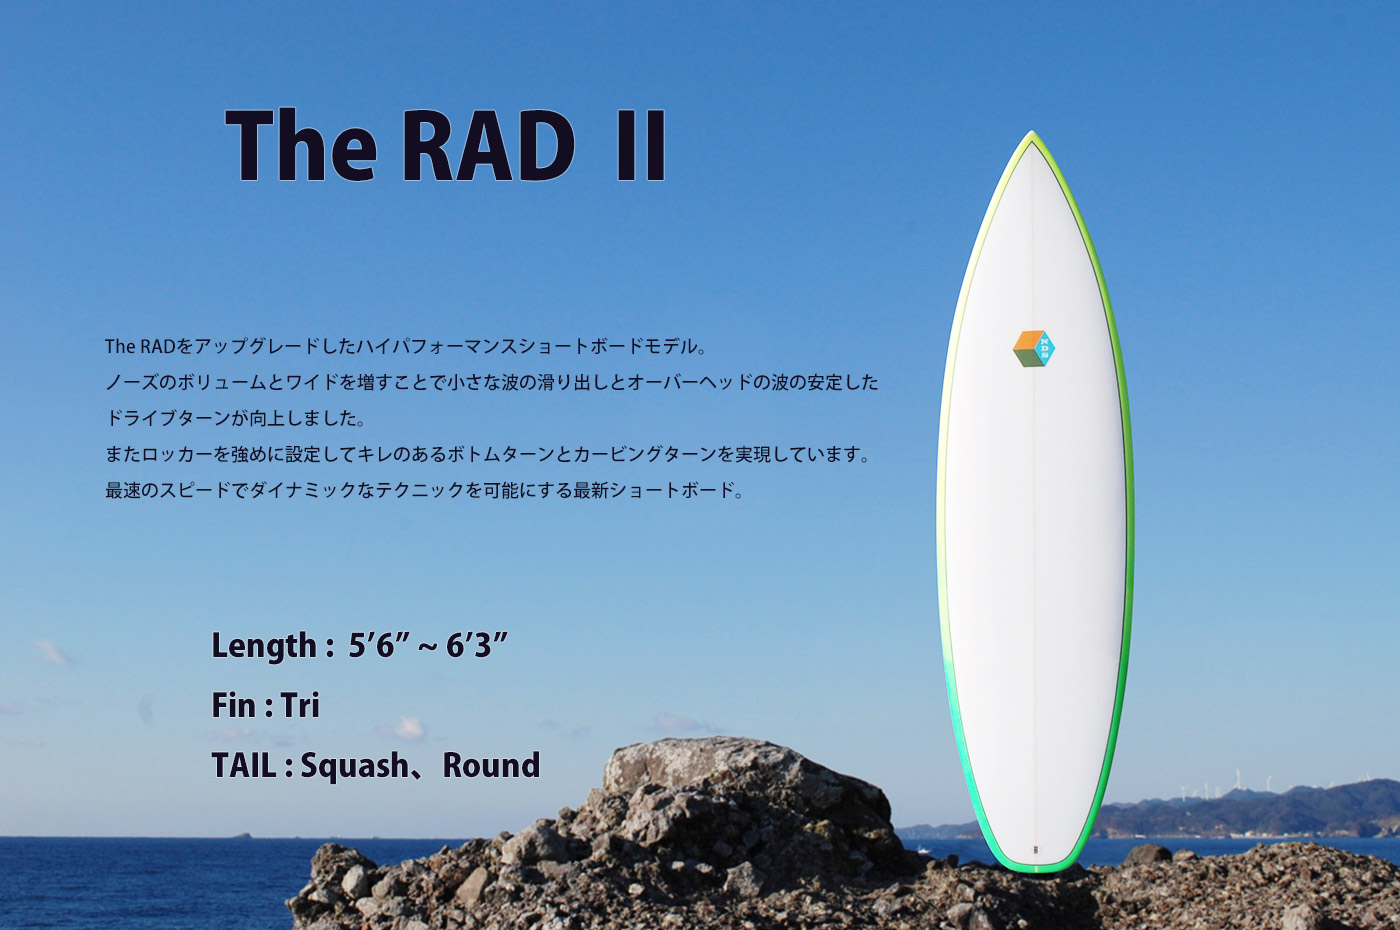 The RAD Ⅱ